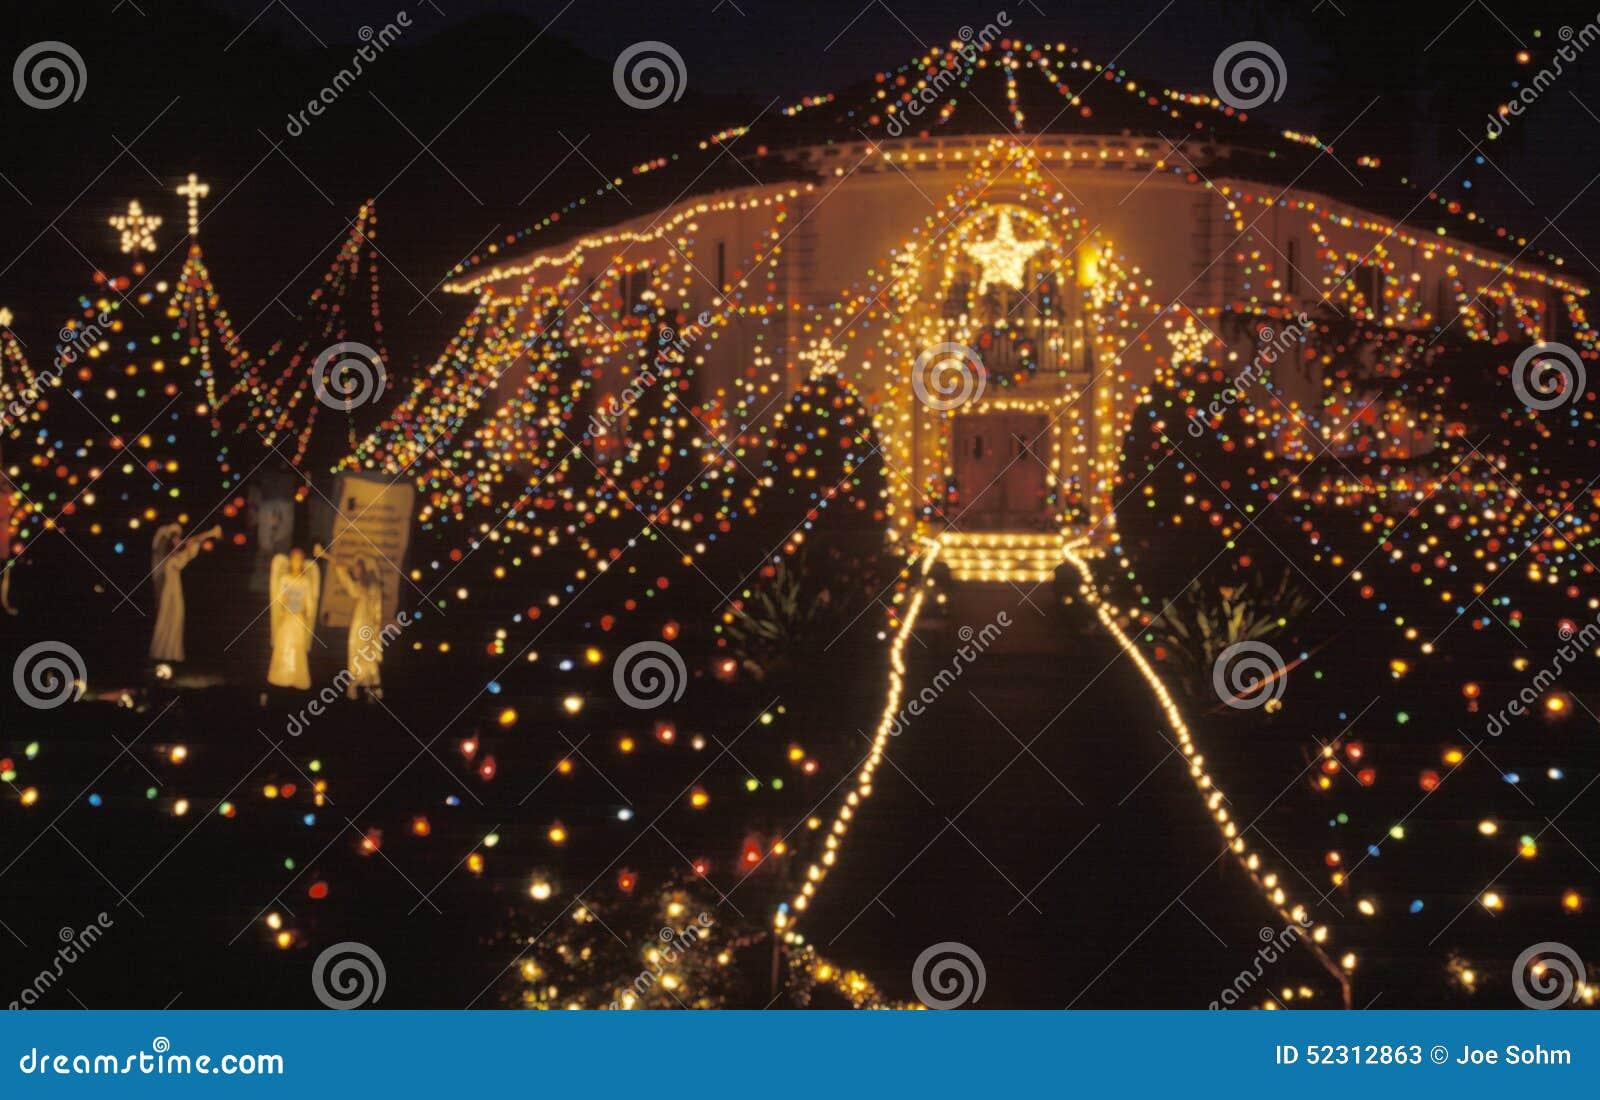 Balad House Decorated With Christmas Lights At Night, Pasadena ...